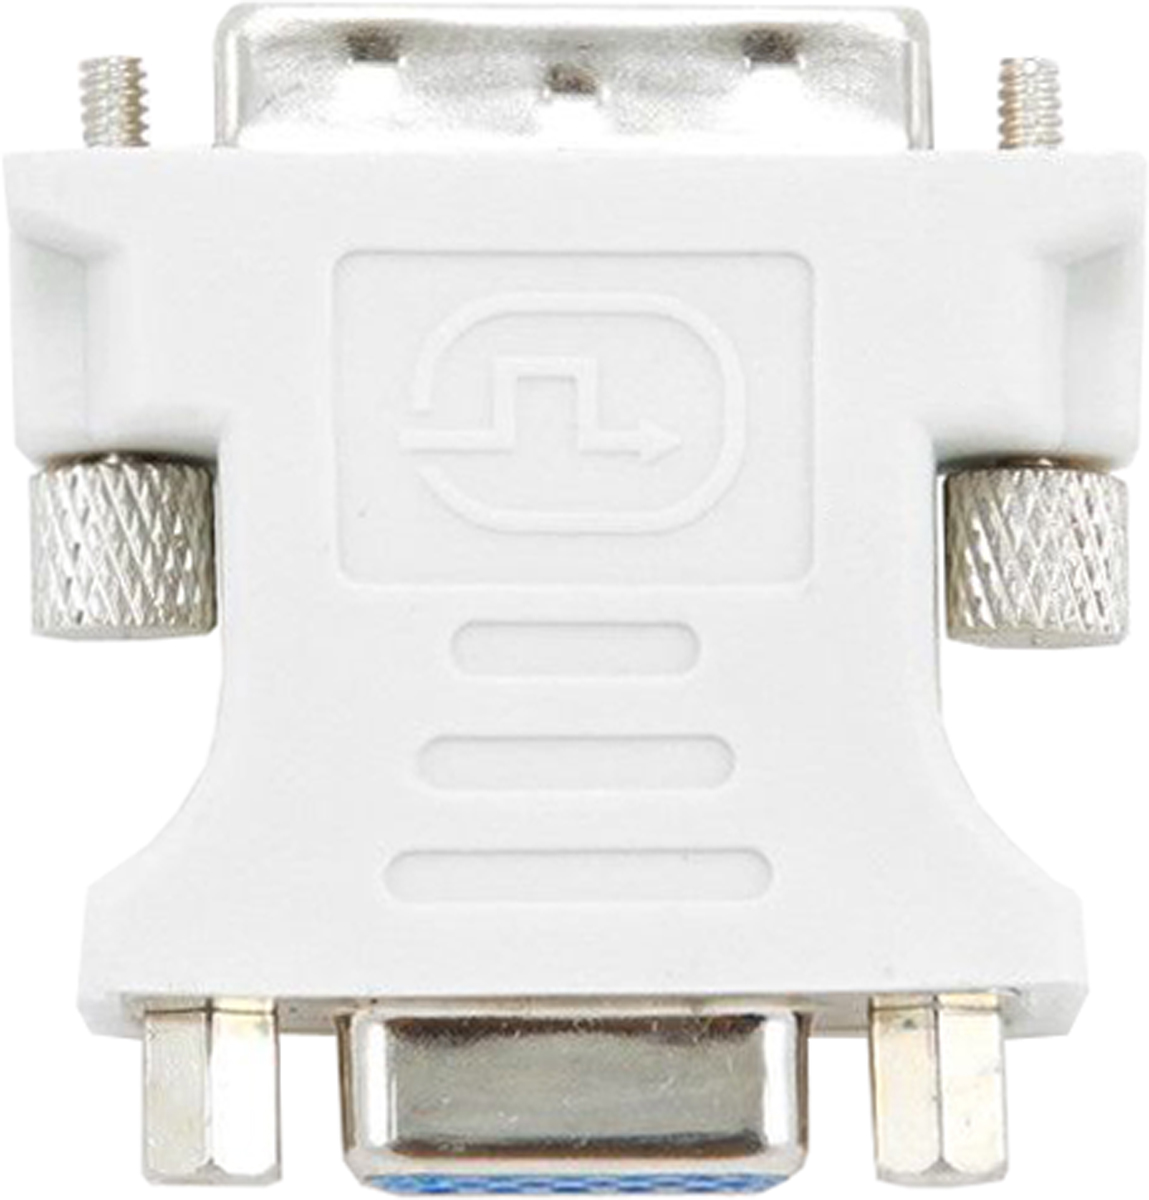 Cablexpert A-DVI-VGA переходник DVI-I-VGA 29M/15F аксессуар gembird cablexpert dvi vga 29m 15f a dvi vga